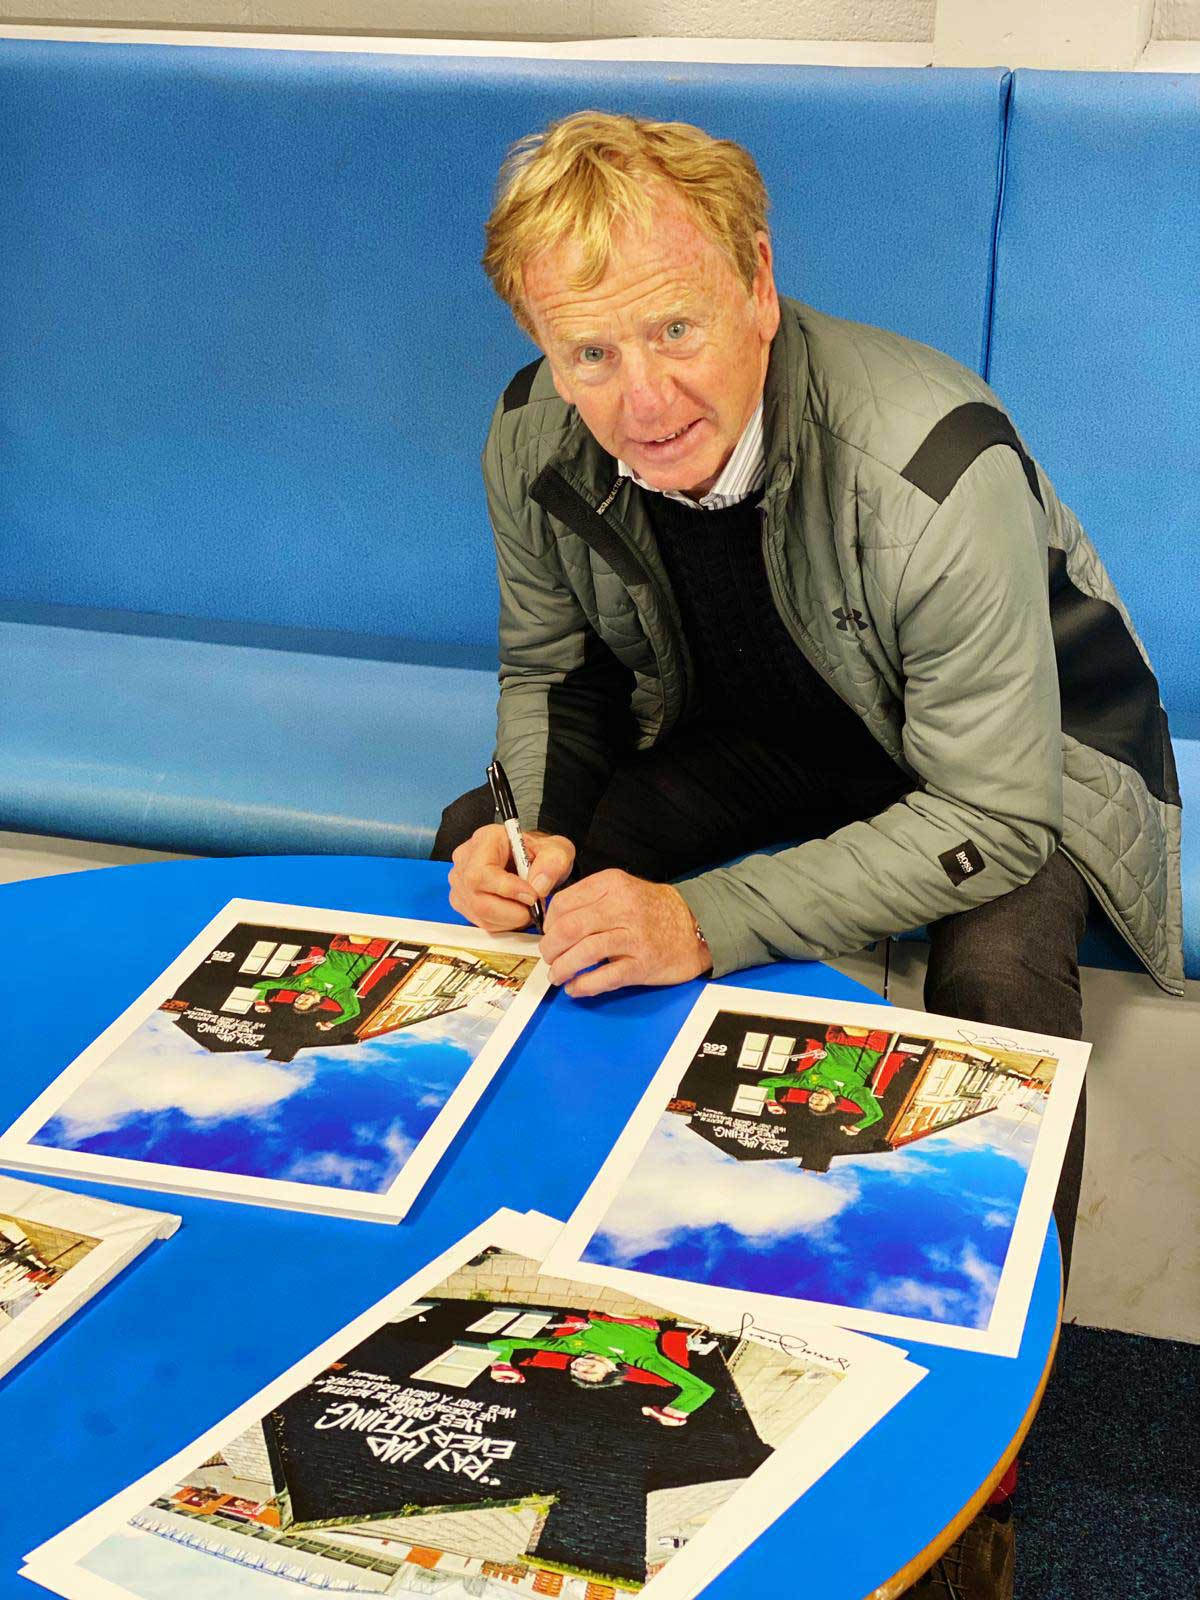 David-Fairclough-Signs-Ray-Clemence-Limited-Edition-Print